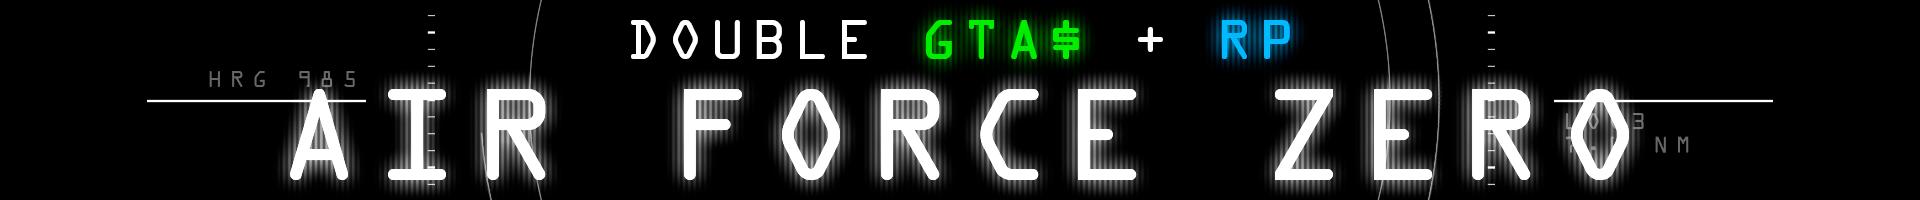 Flight Week in GTA Online - Rockstar Games